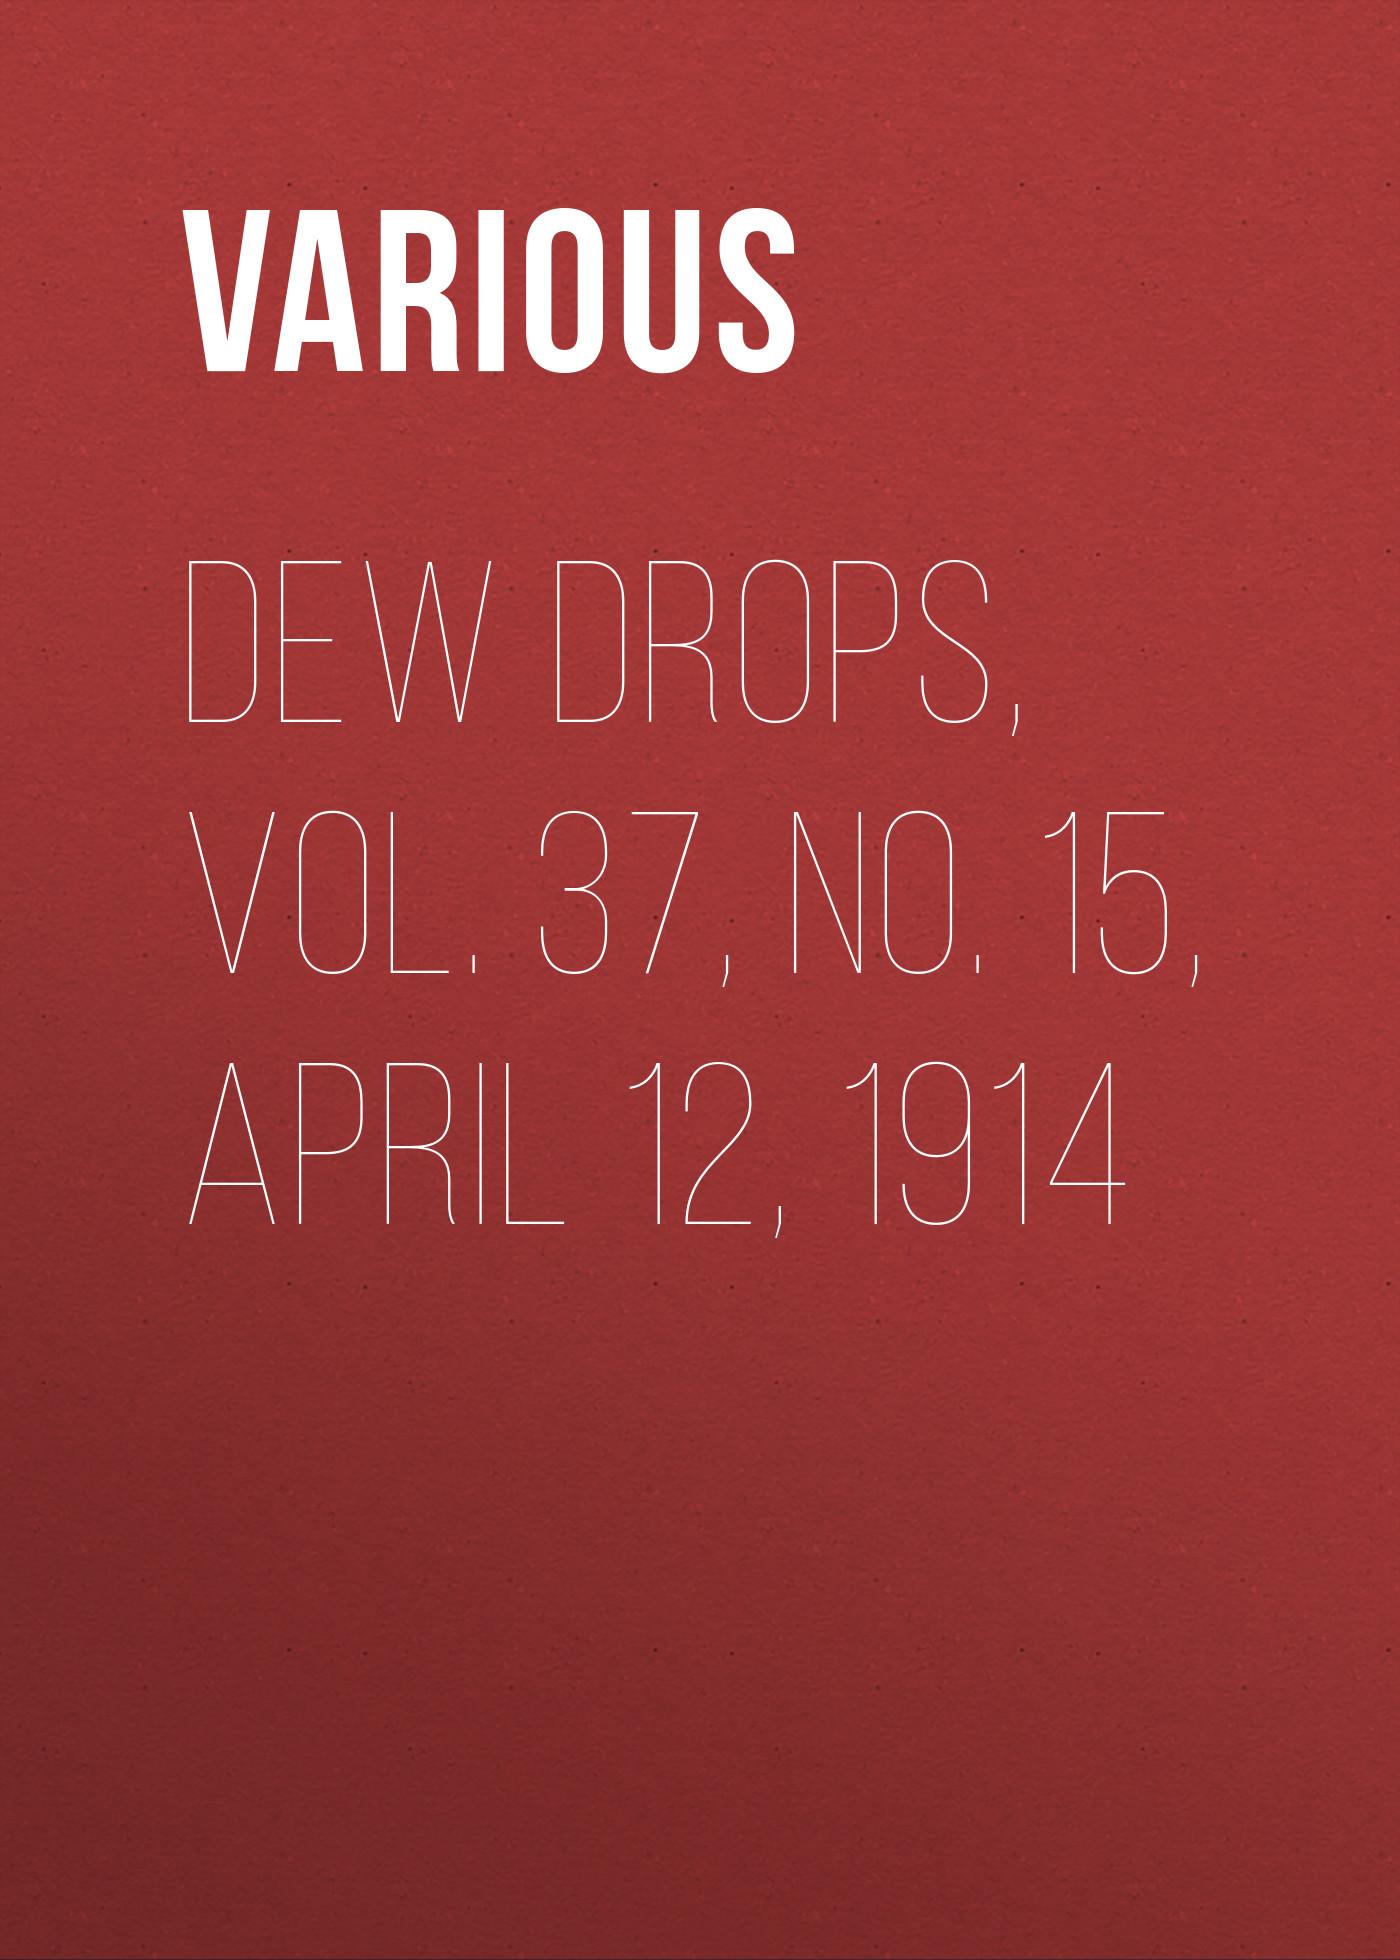 купить Various Dew Drops, Vol. 37, No. 15, April 12, 1914 по цене 0 рублей